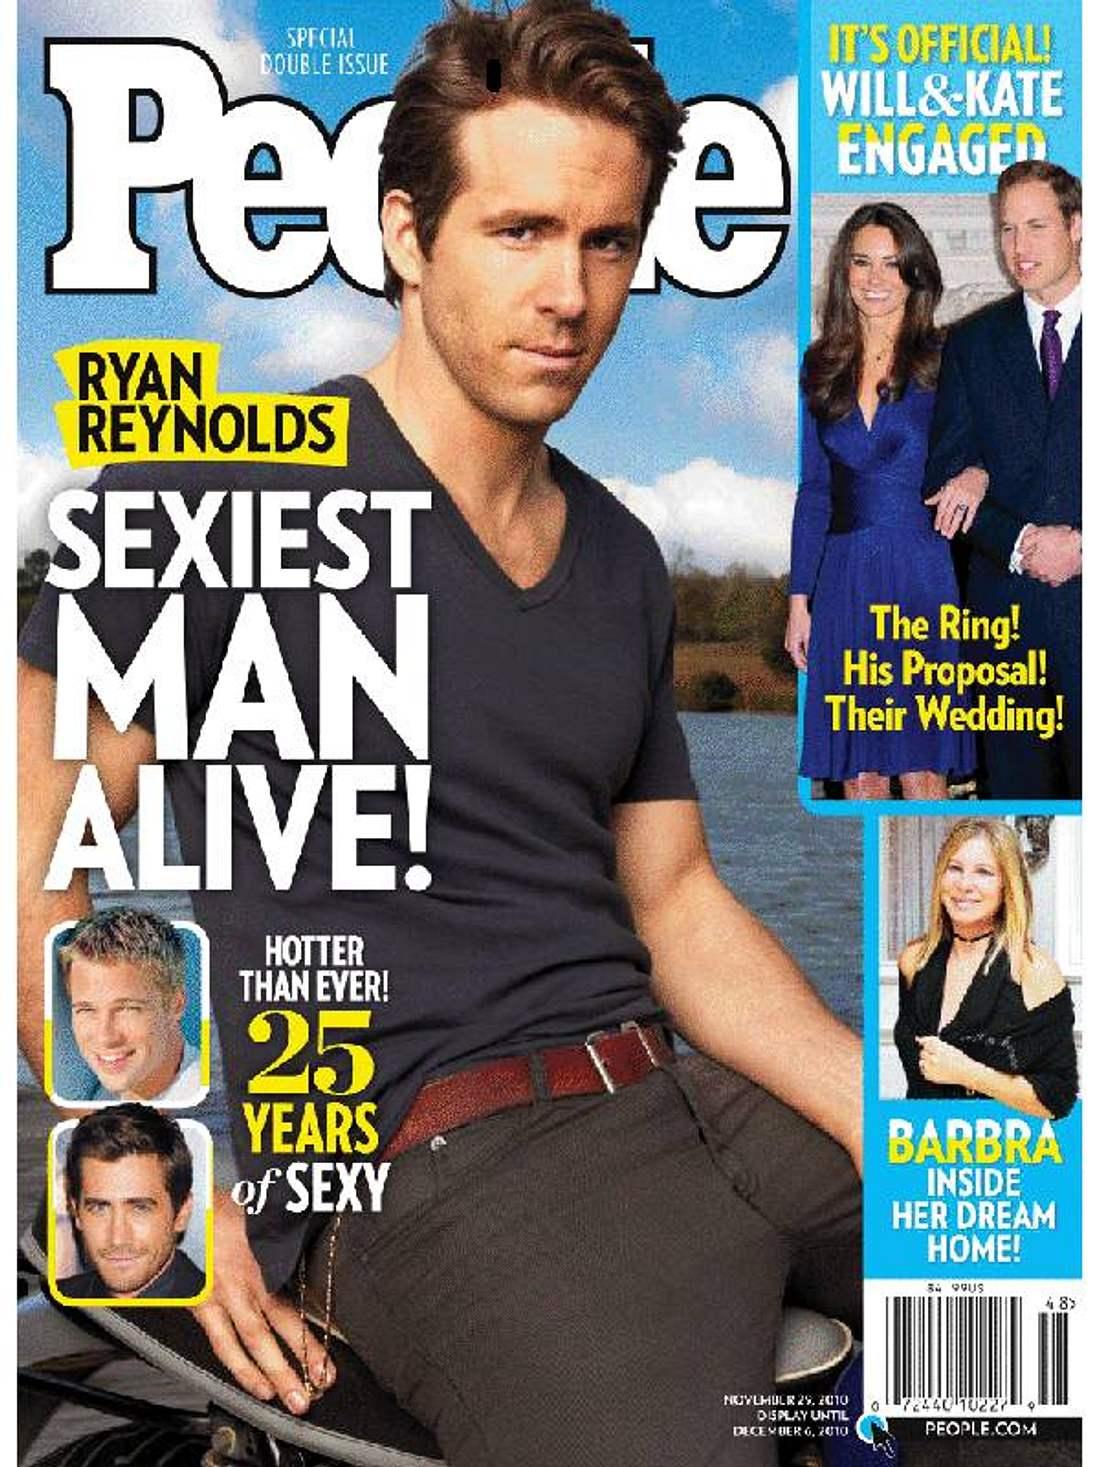 Die Sexiest Men Alive - Bild 1